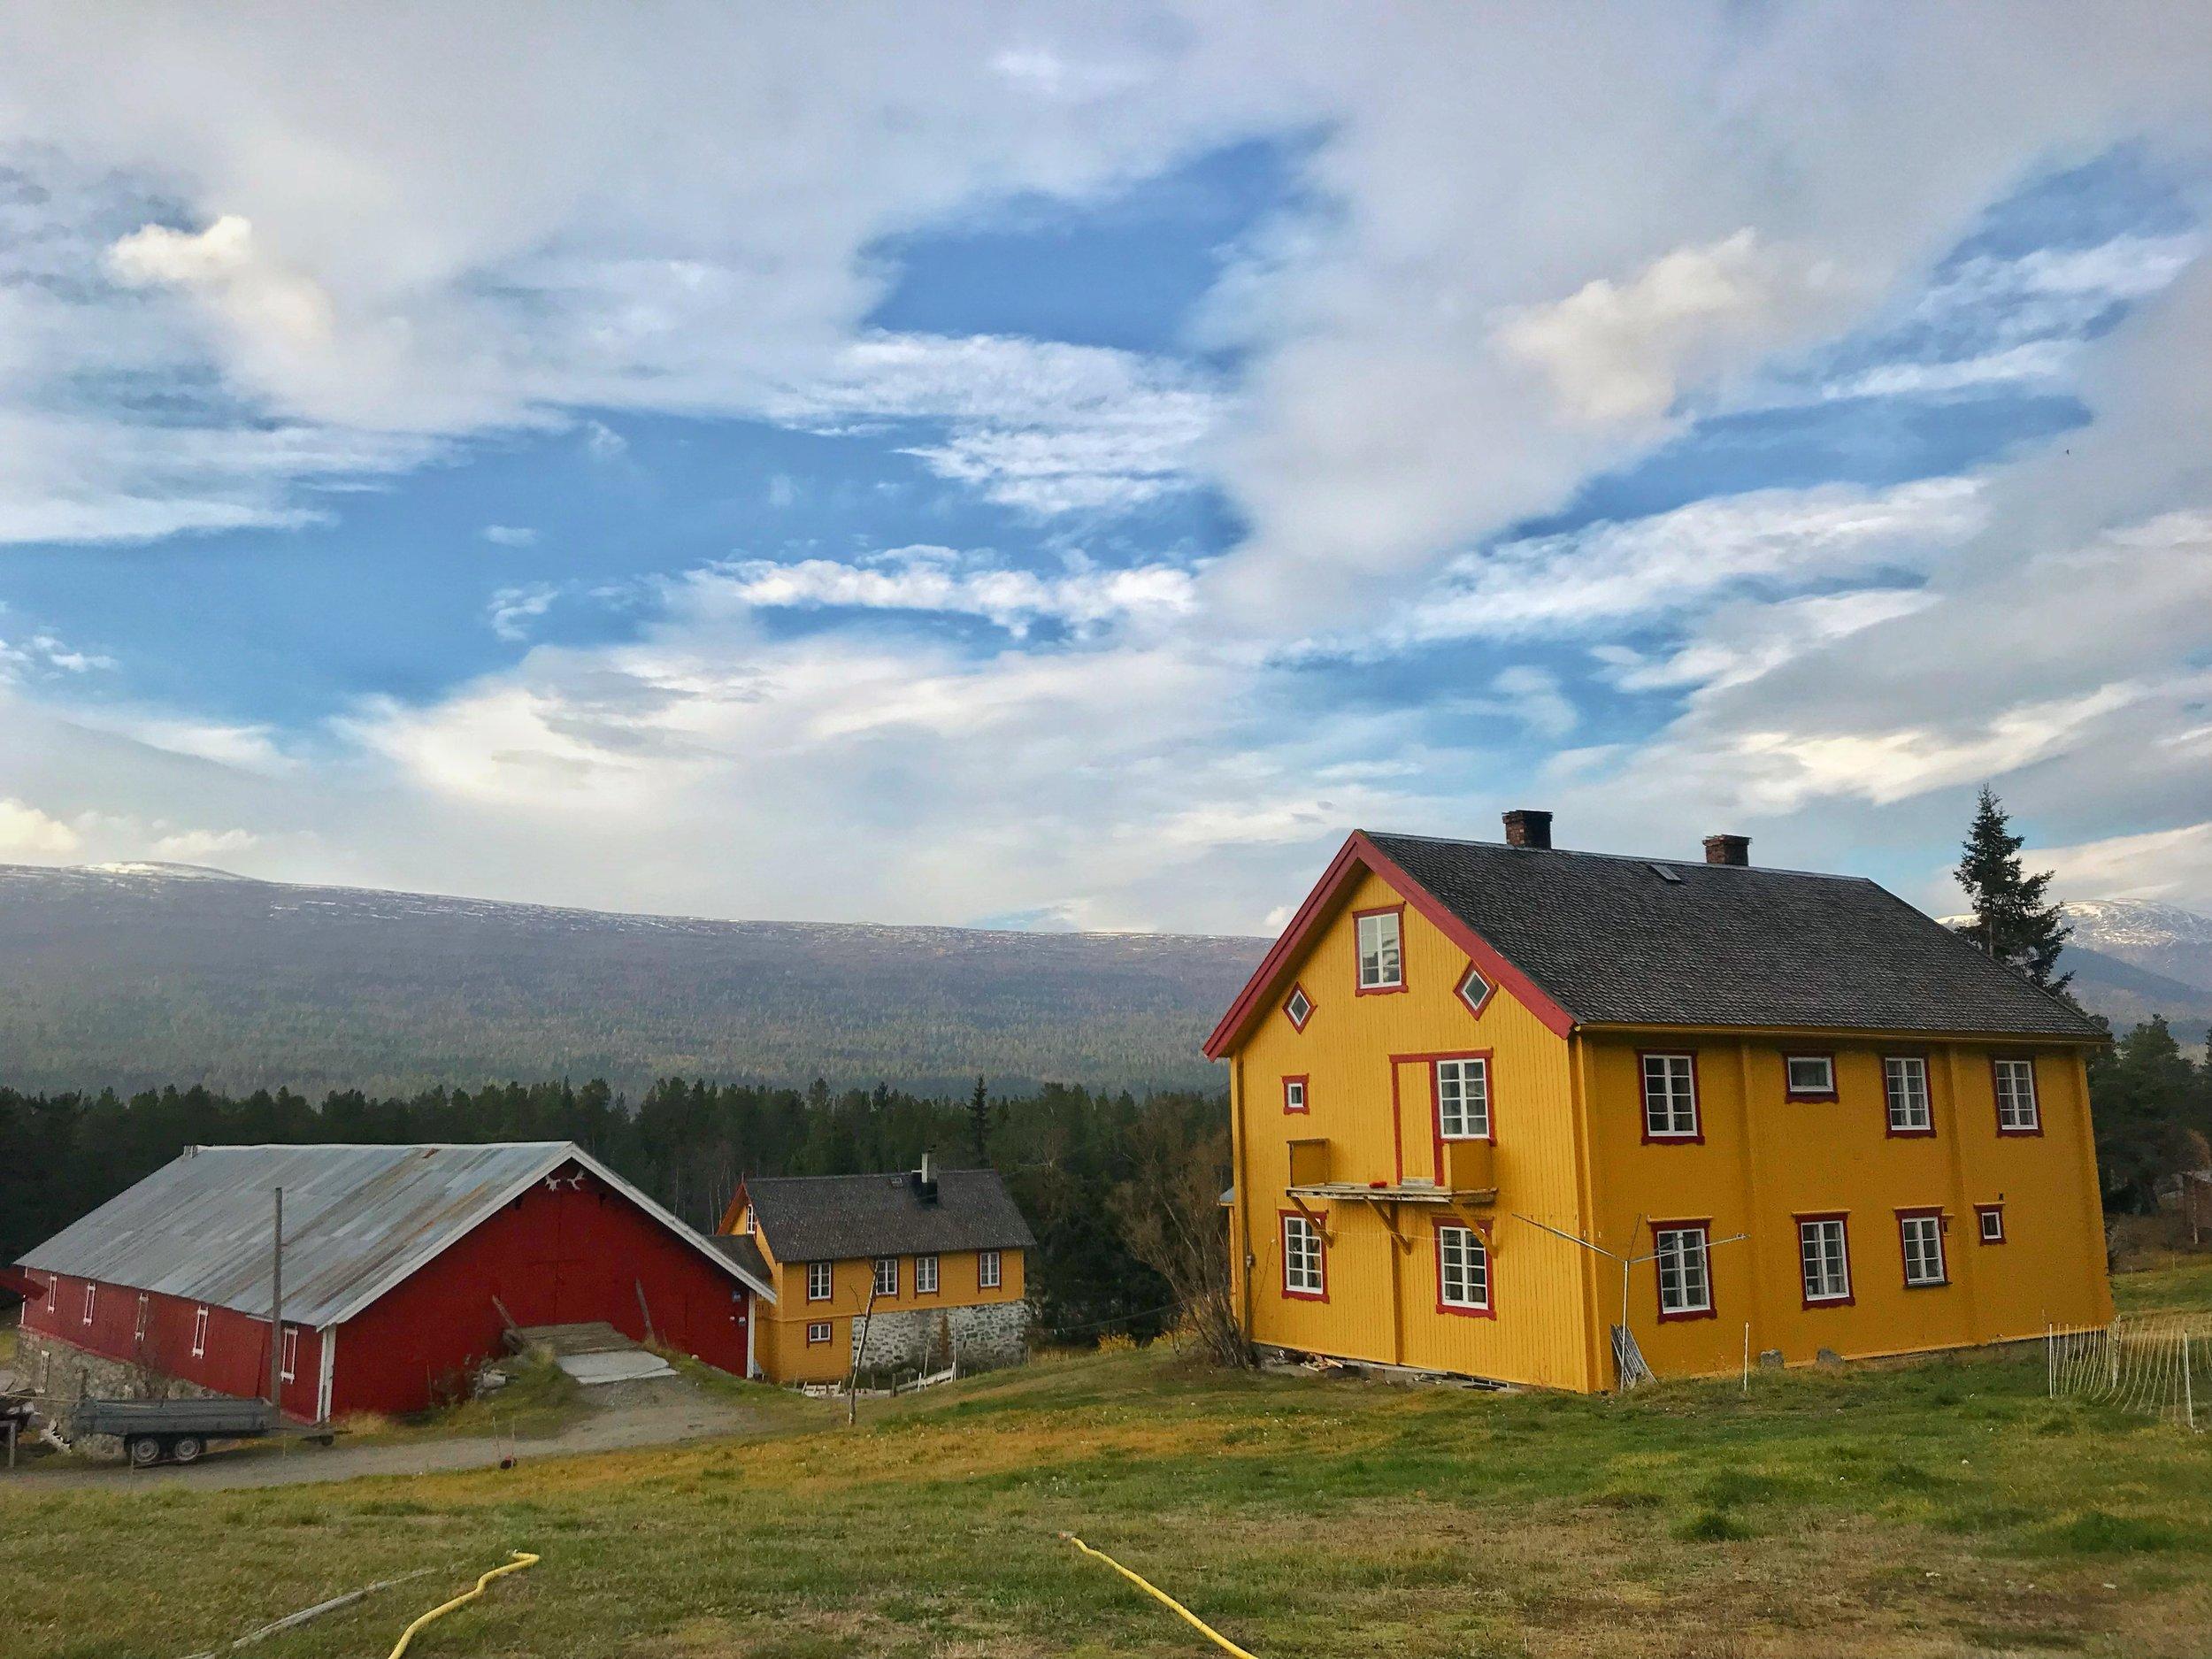 Ødegården - Romsdalsvegen 4937, Lesjaskog